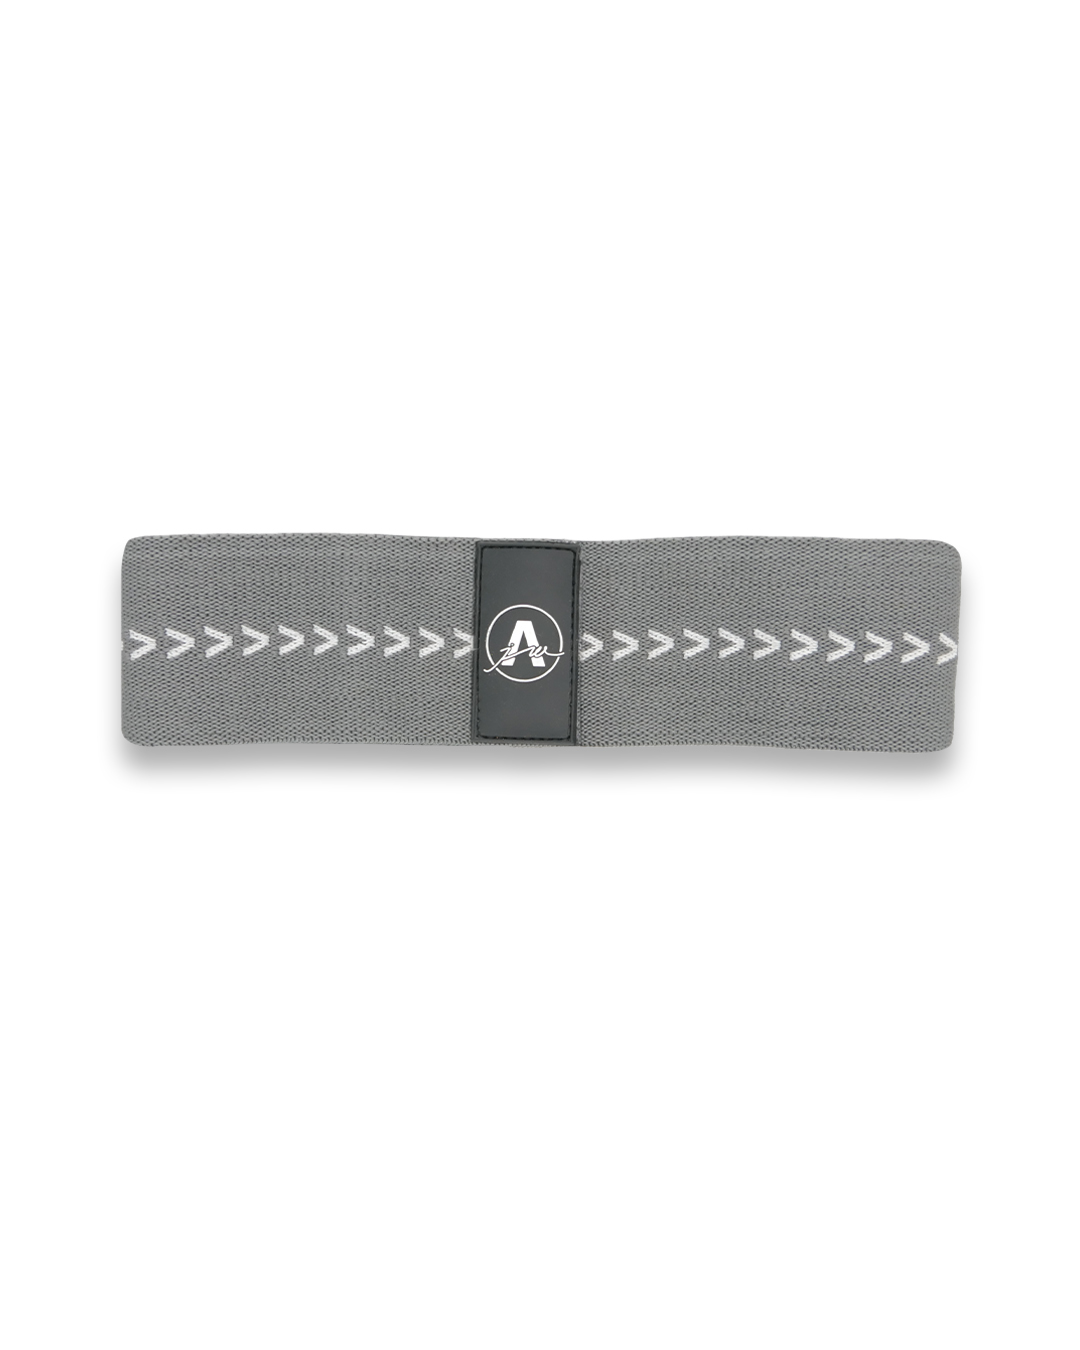 Fabric Short Resistance Band - Medium